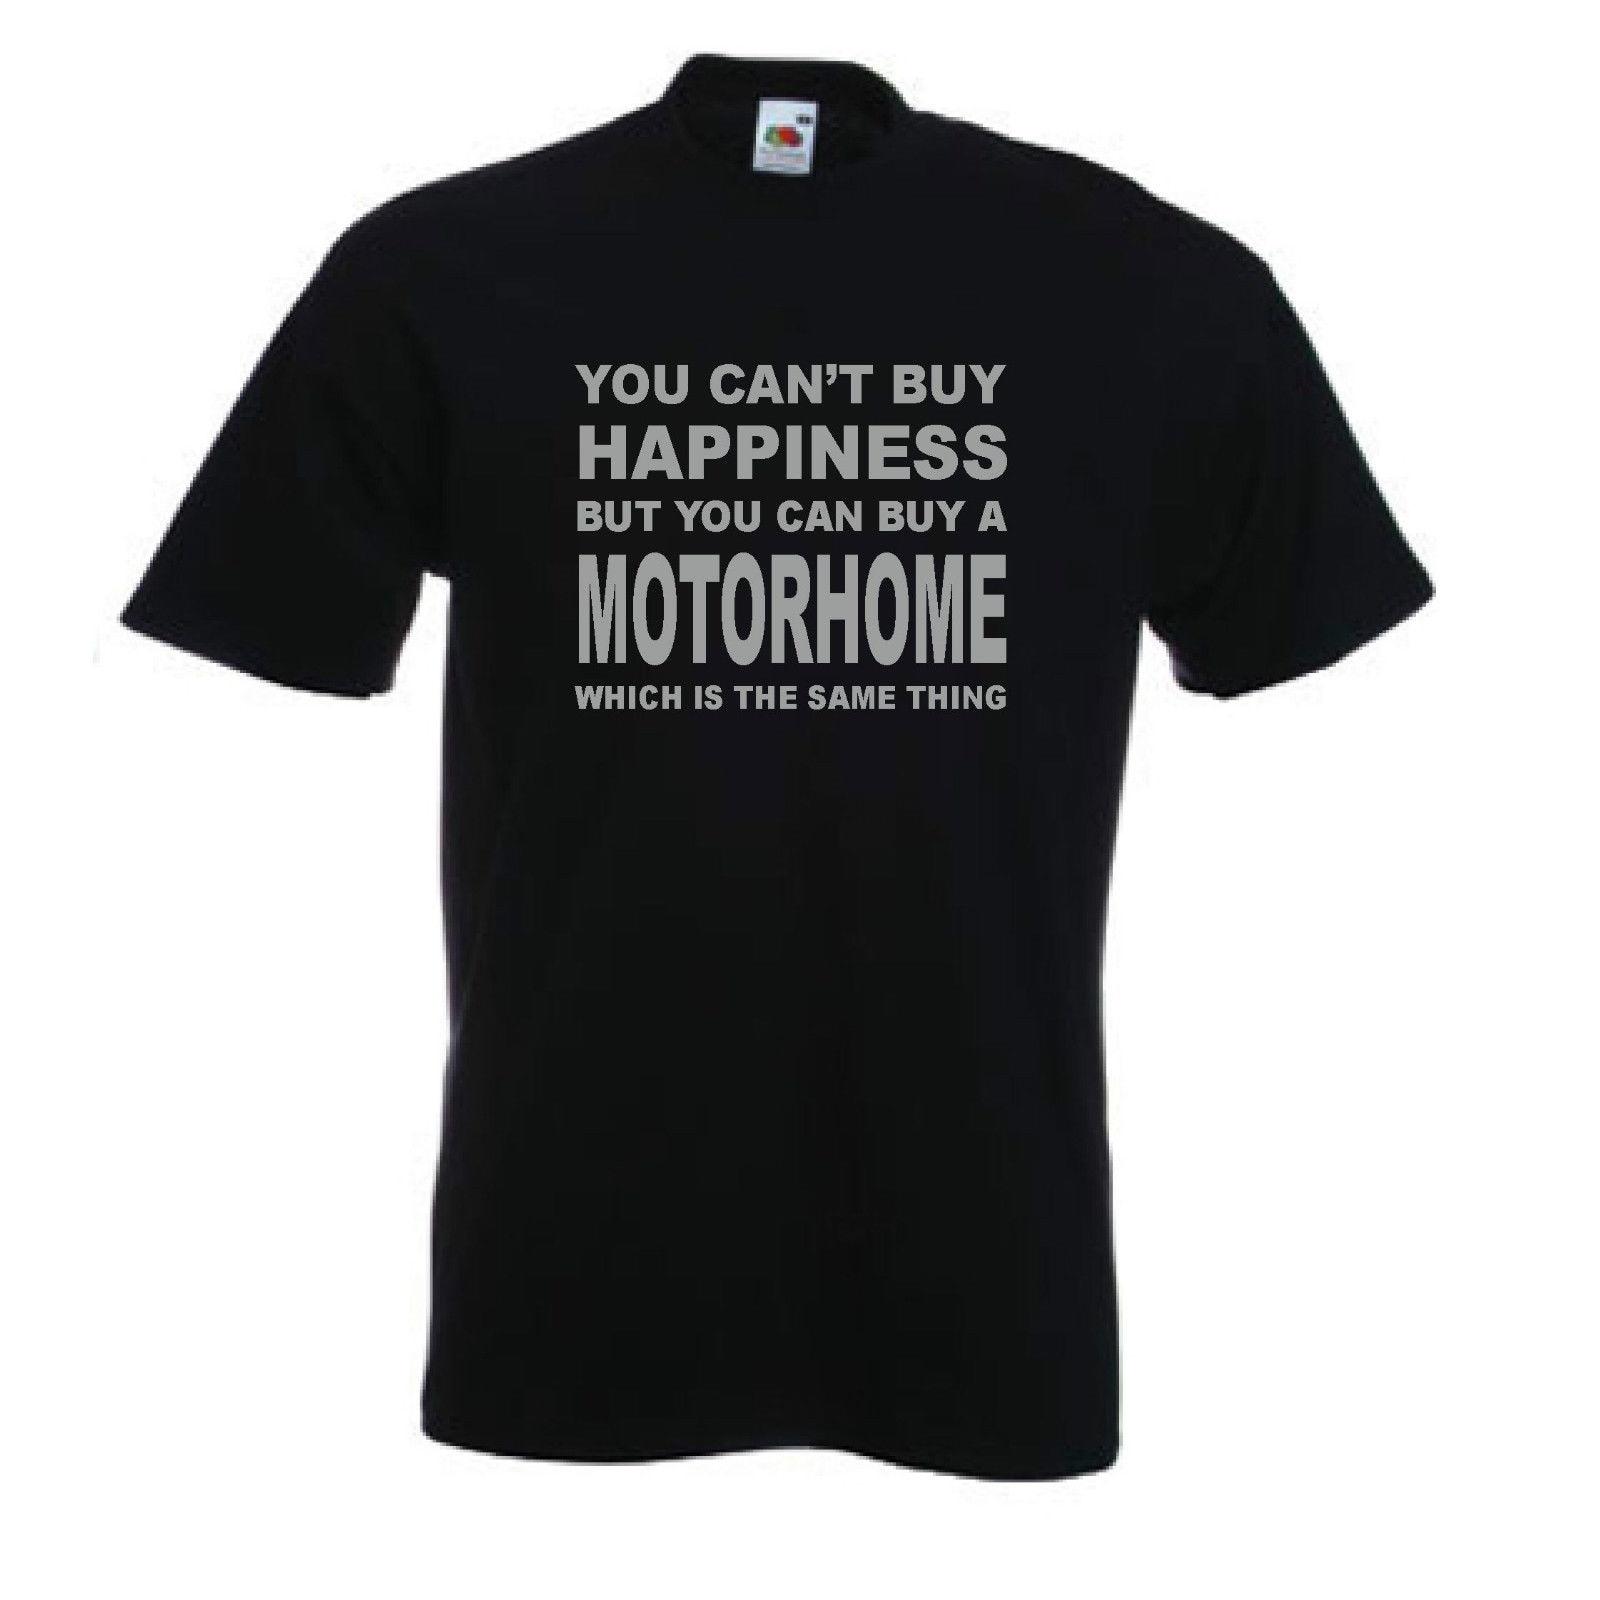 Motorhome T-Shirt Funny Campinger TShirt T Shirt Campervan Caravan Sizes S-XXL